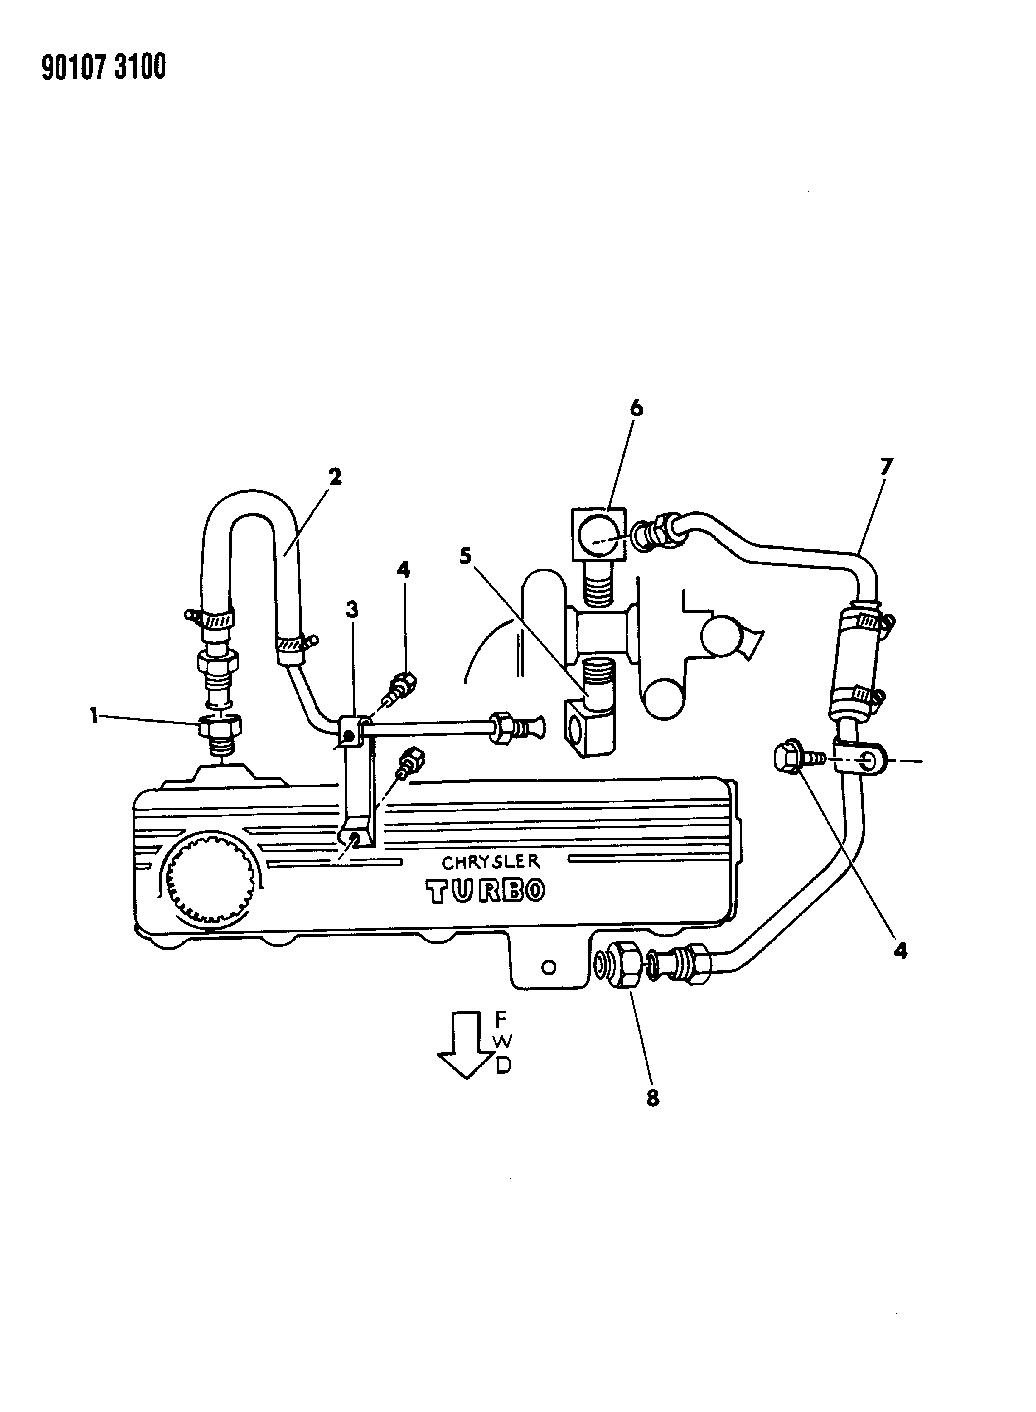 1990 Dodge Spirit Turbo Water Cooled System Mopar Parts Giant Wiring Diagram